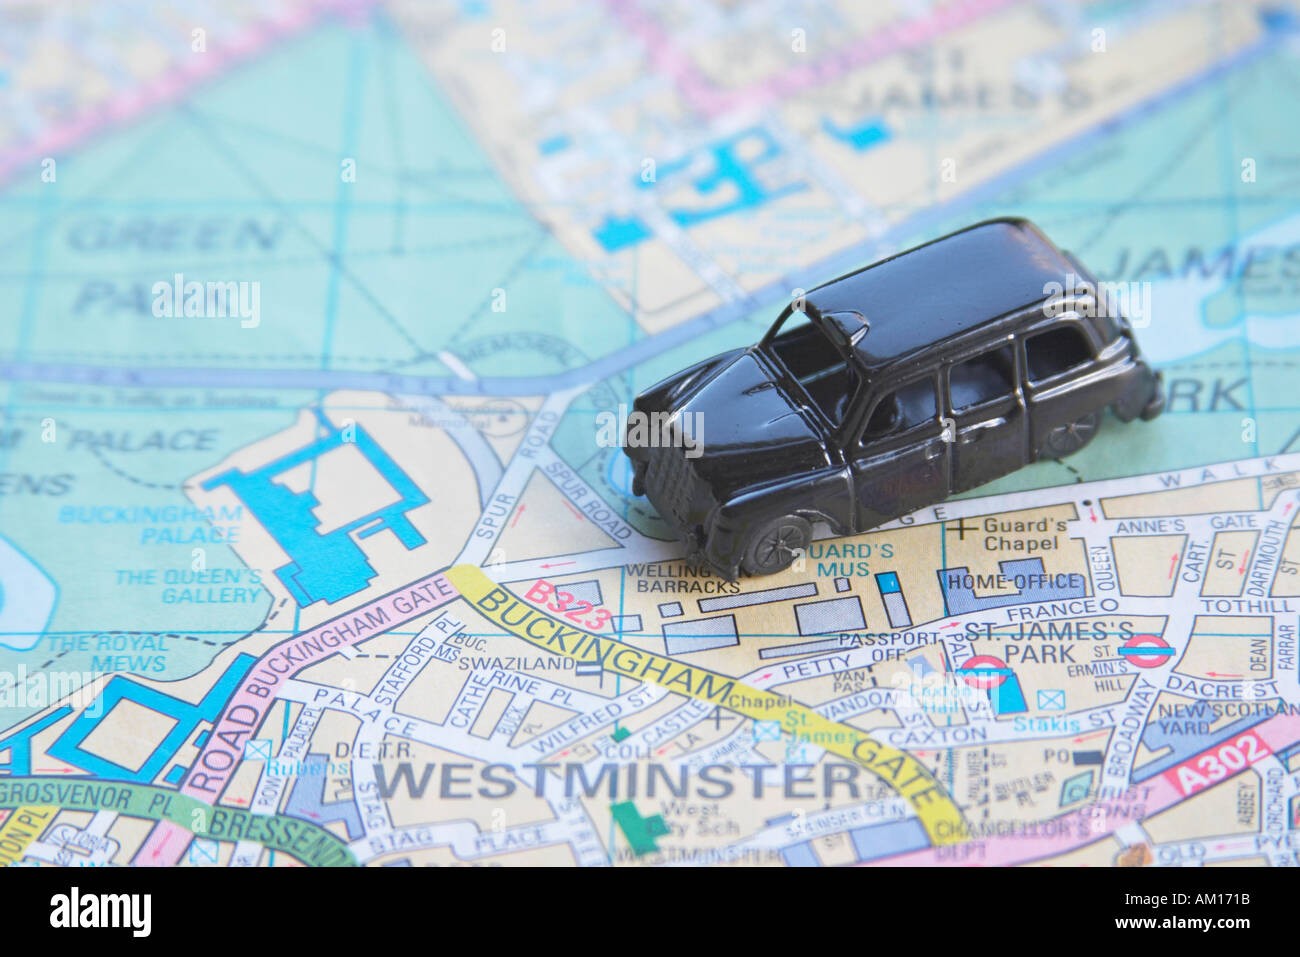 Taxi Taxi noir sur la carte de London Angleterre Grande-bretagne Royaume-Uni UK Photo Stock